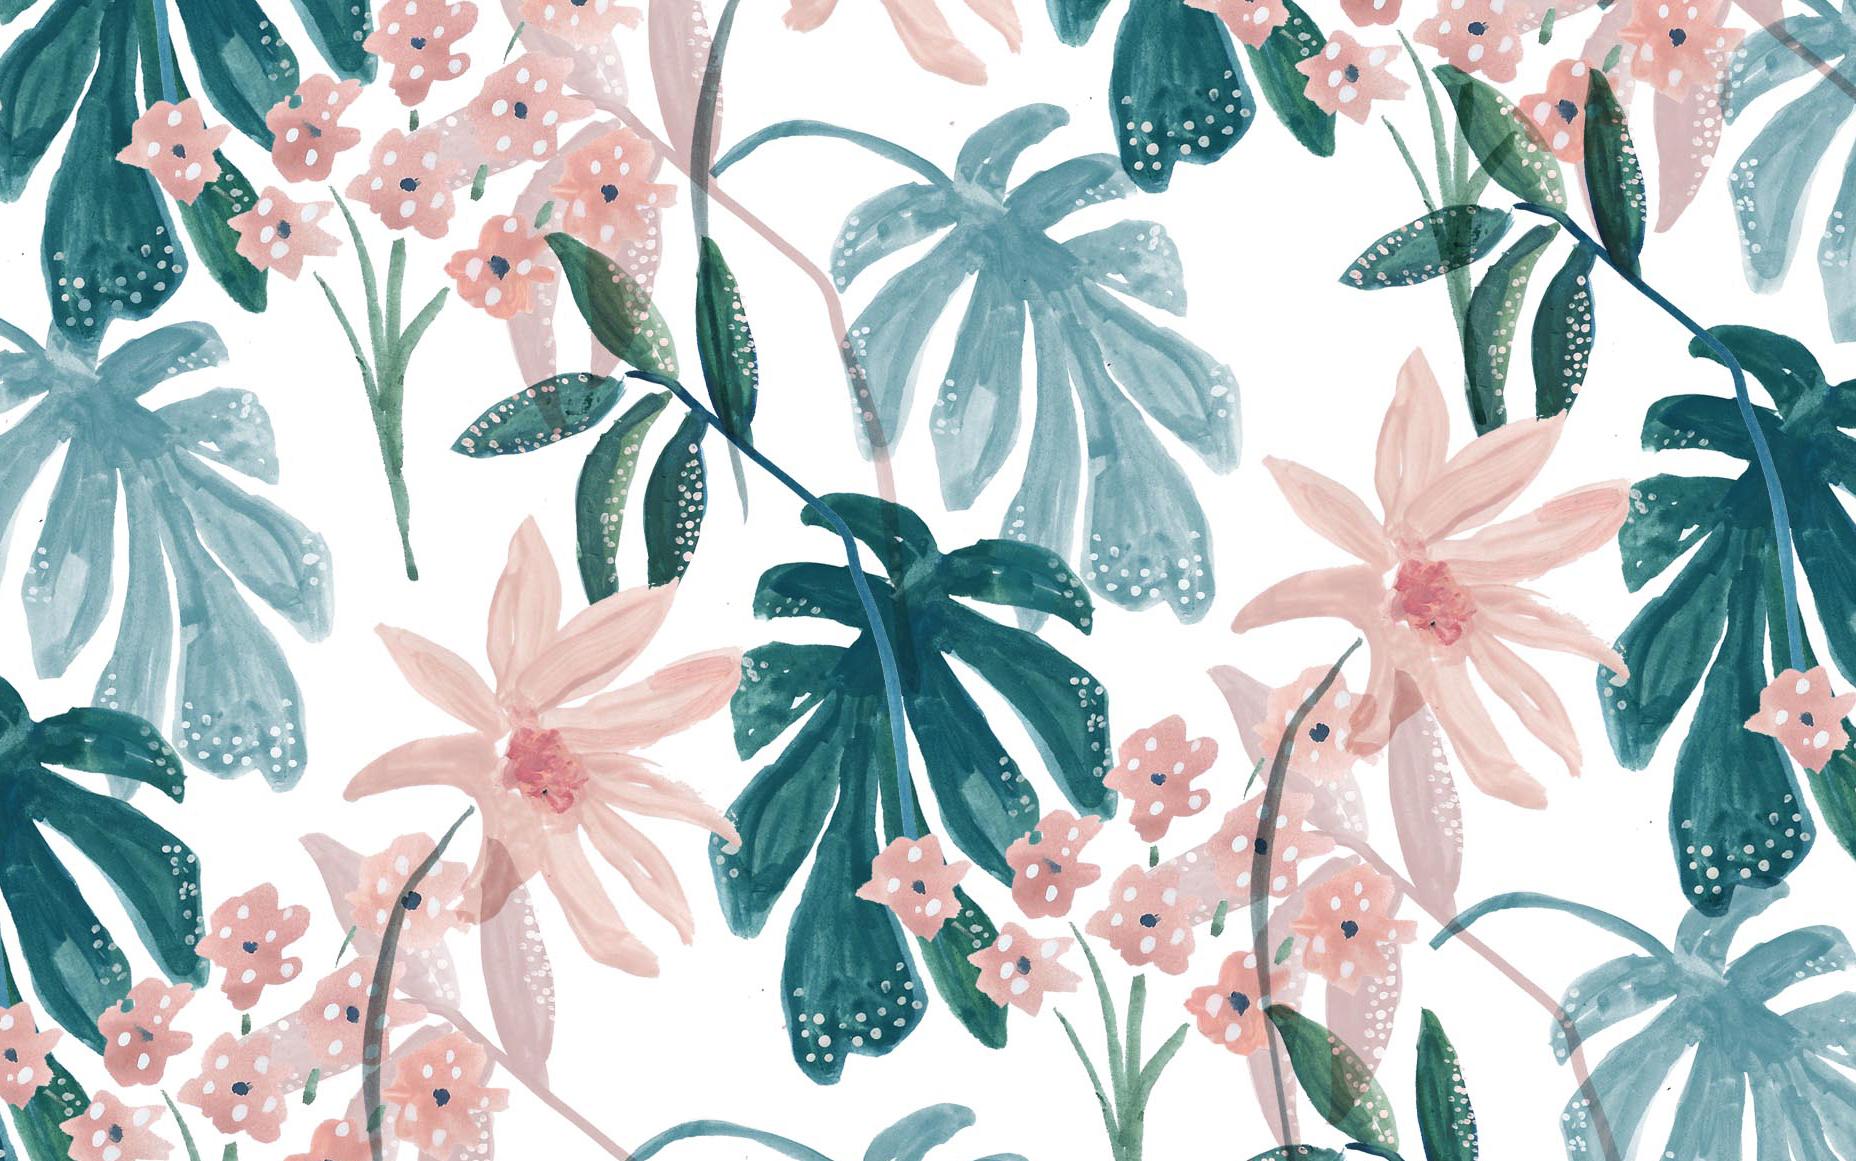 53 Best Love Hd Wallpapers Images On Pinterest: 寫了很多手機桌布文,其實電腦桌面也超重要啊!這篇收藏起來,120+ 張桌布快下載吧